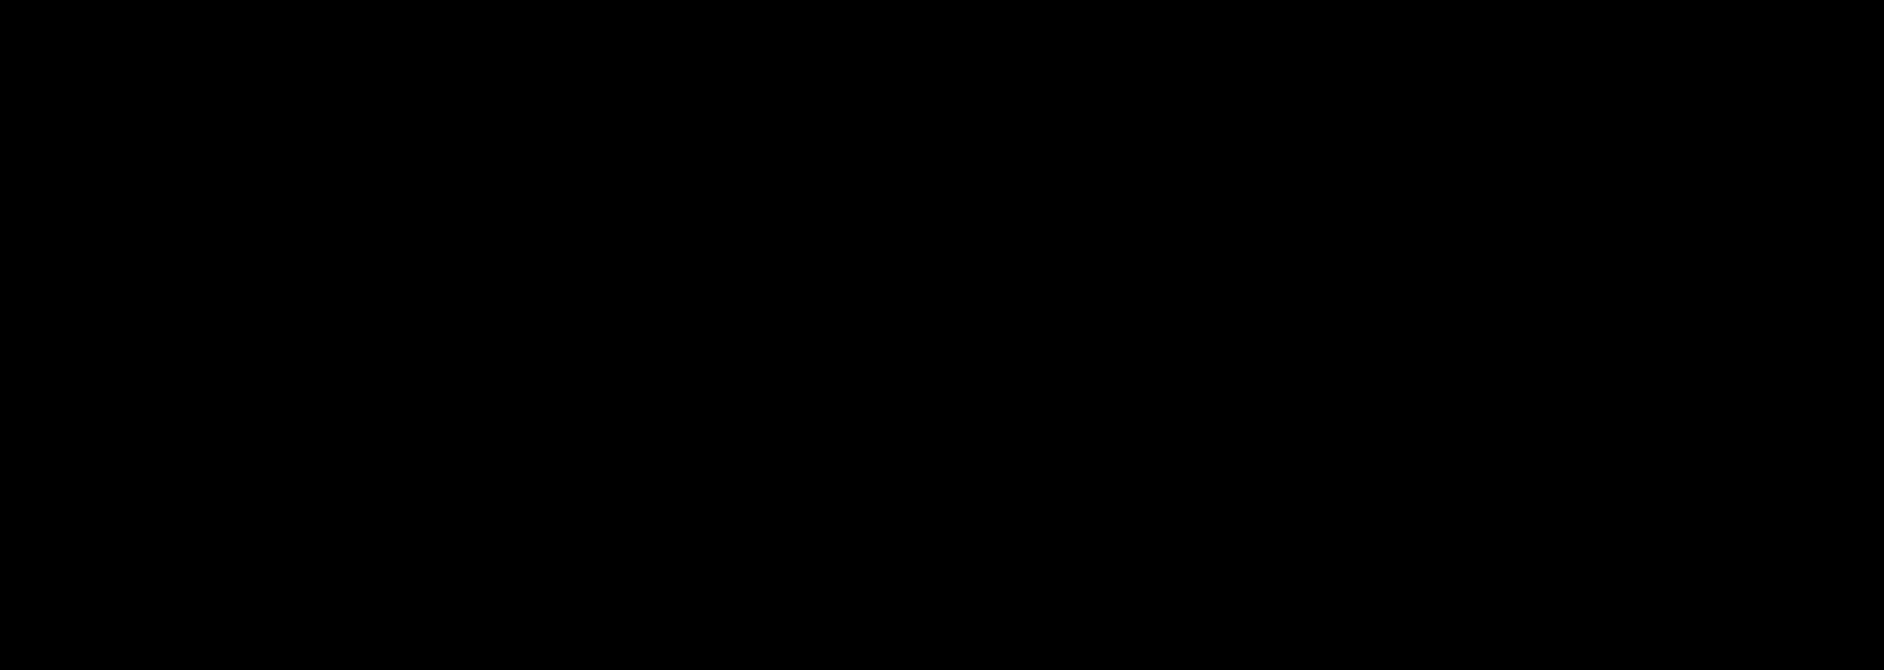 Bisphenol-A-(diphenyl-<sup>13</sup>C<sub>12</sub>) β-D-glucuronide